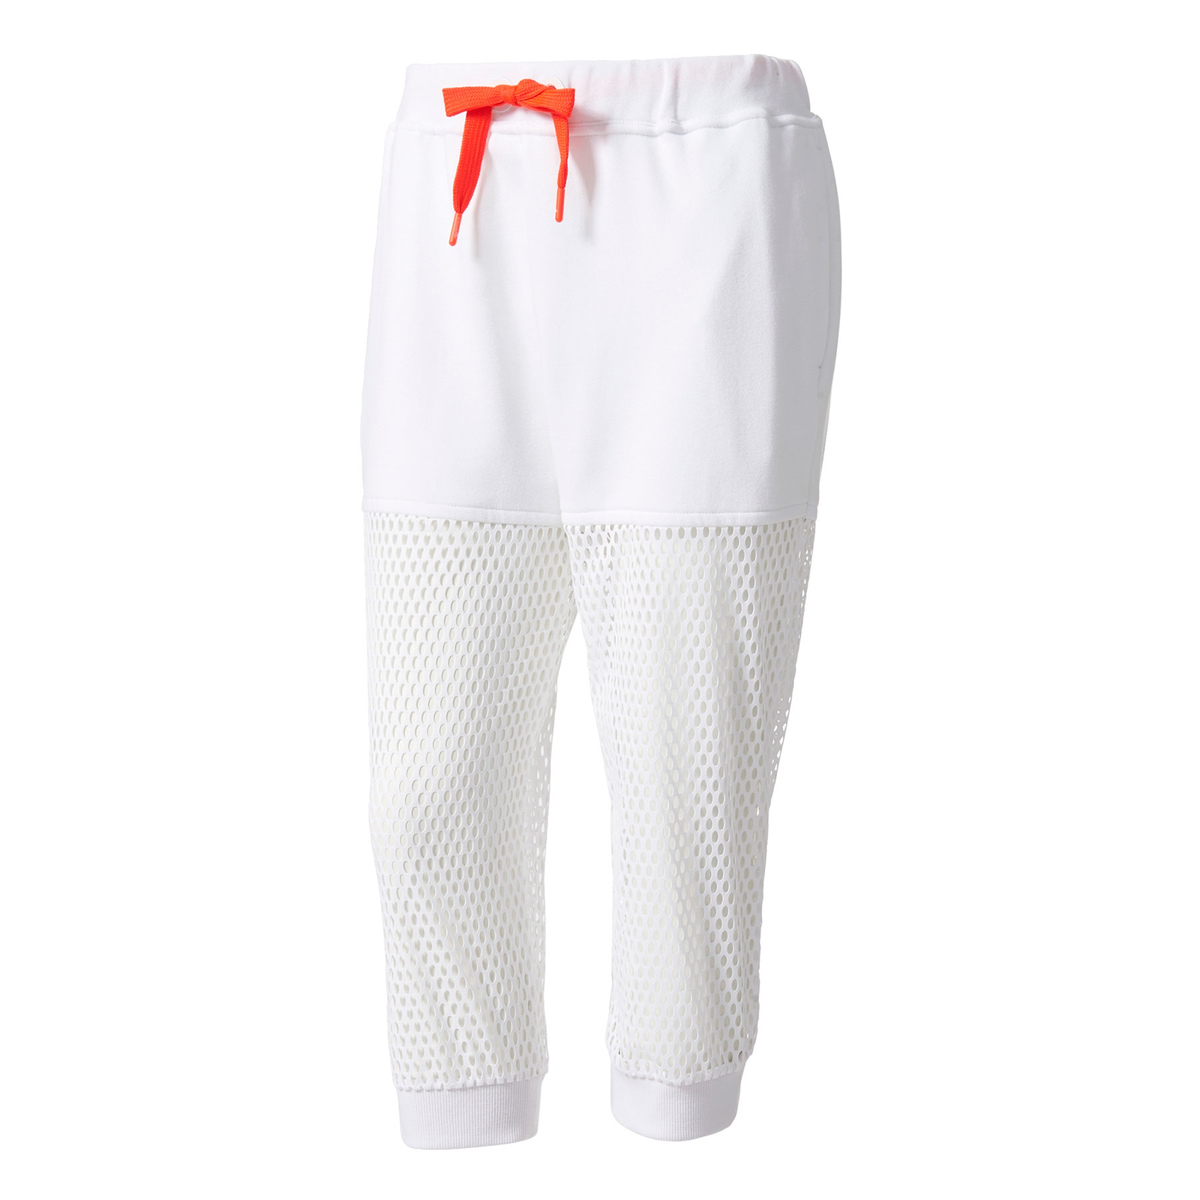 Pantalone 3/4 stellasport donna